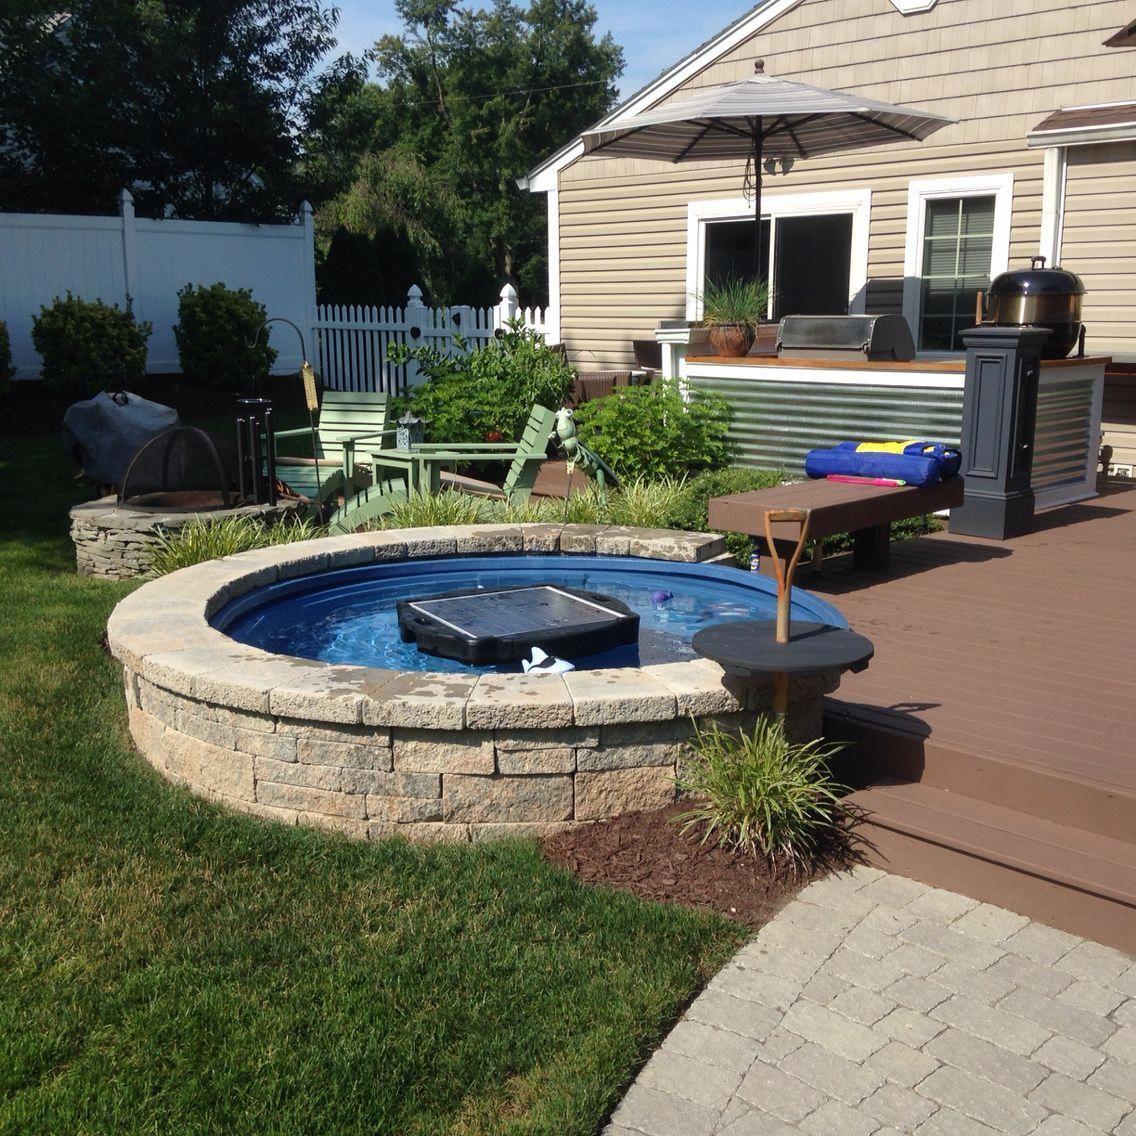 15 Cool Diy Galvanized Tubs Ideas For Your Backyard Verzinkte